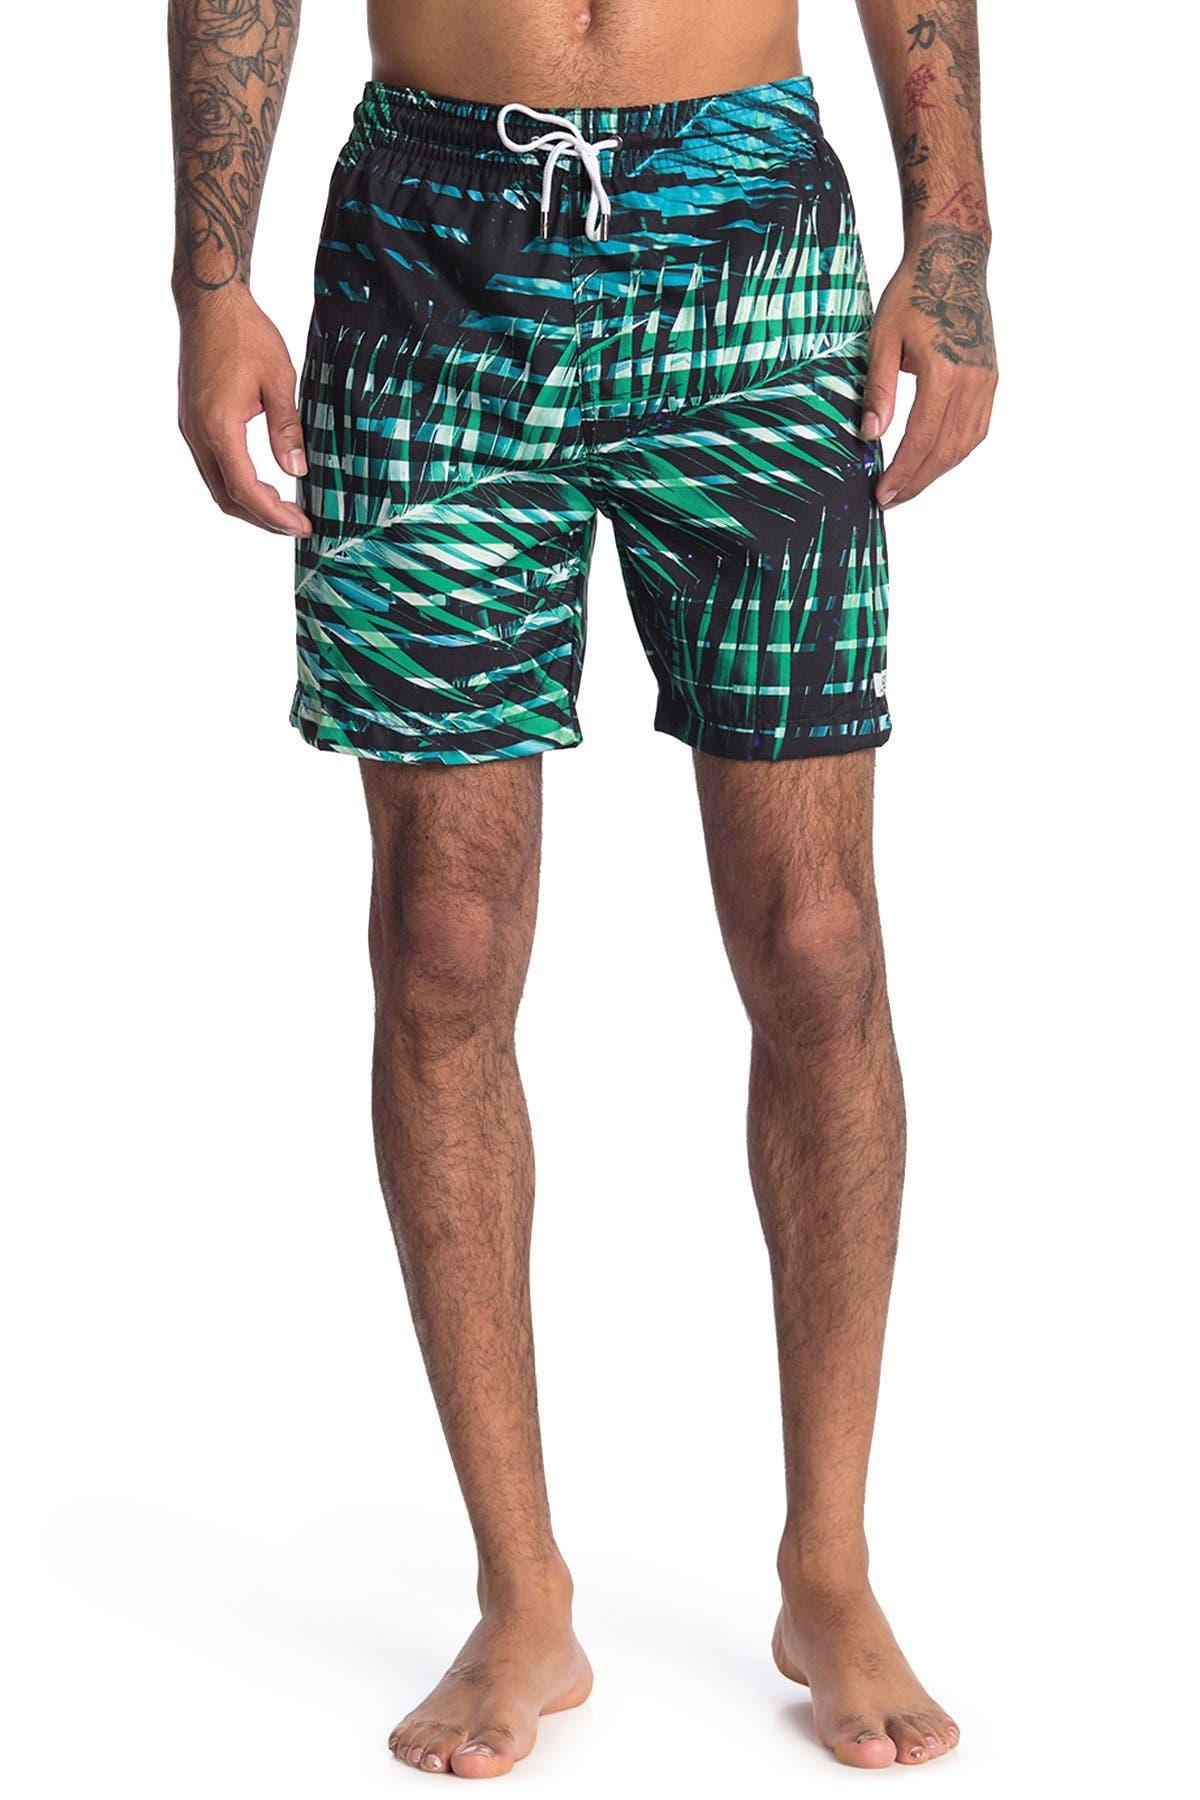 Image of Trunks Surf and Swim CO. Palm Print Swim Trunks